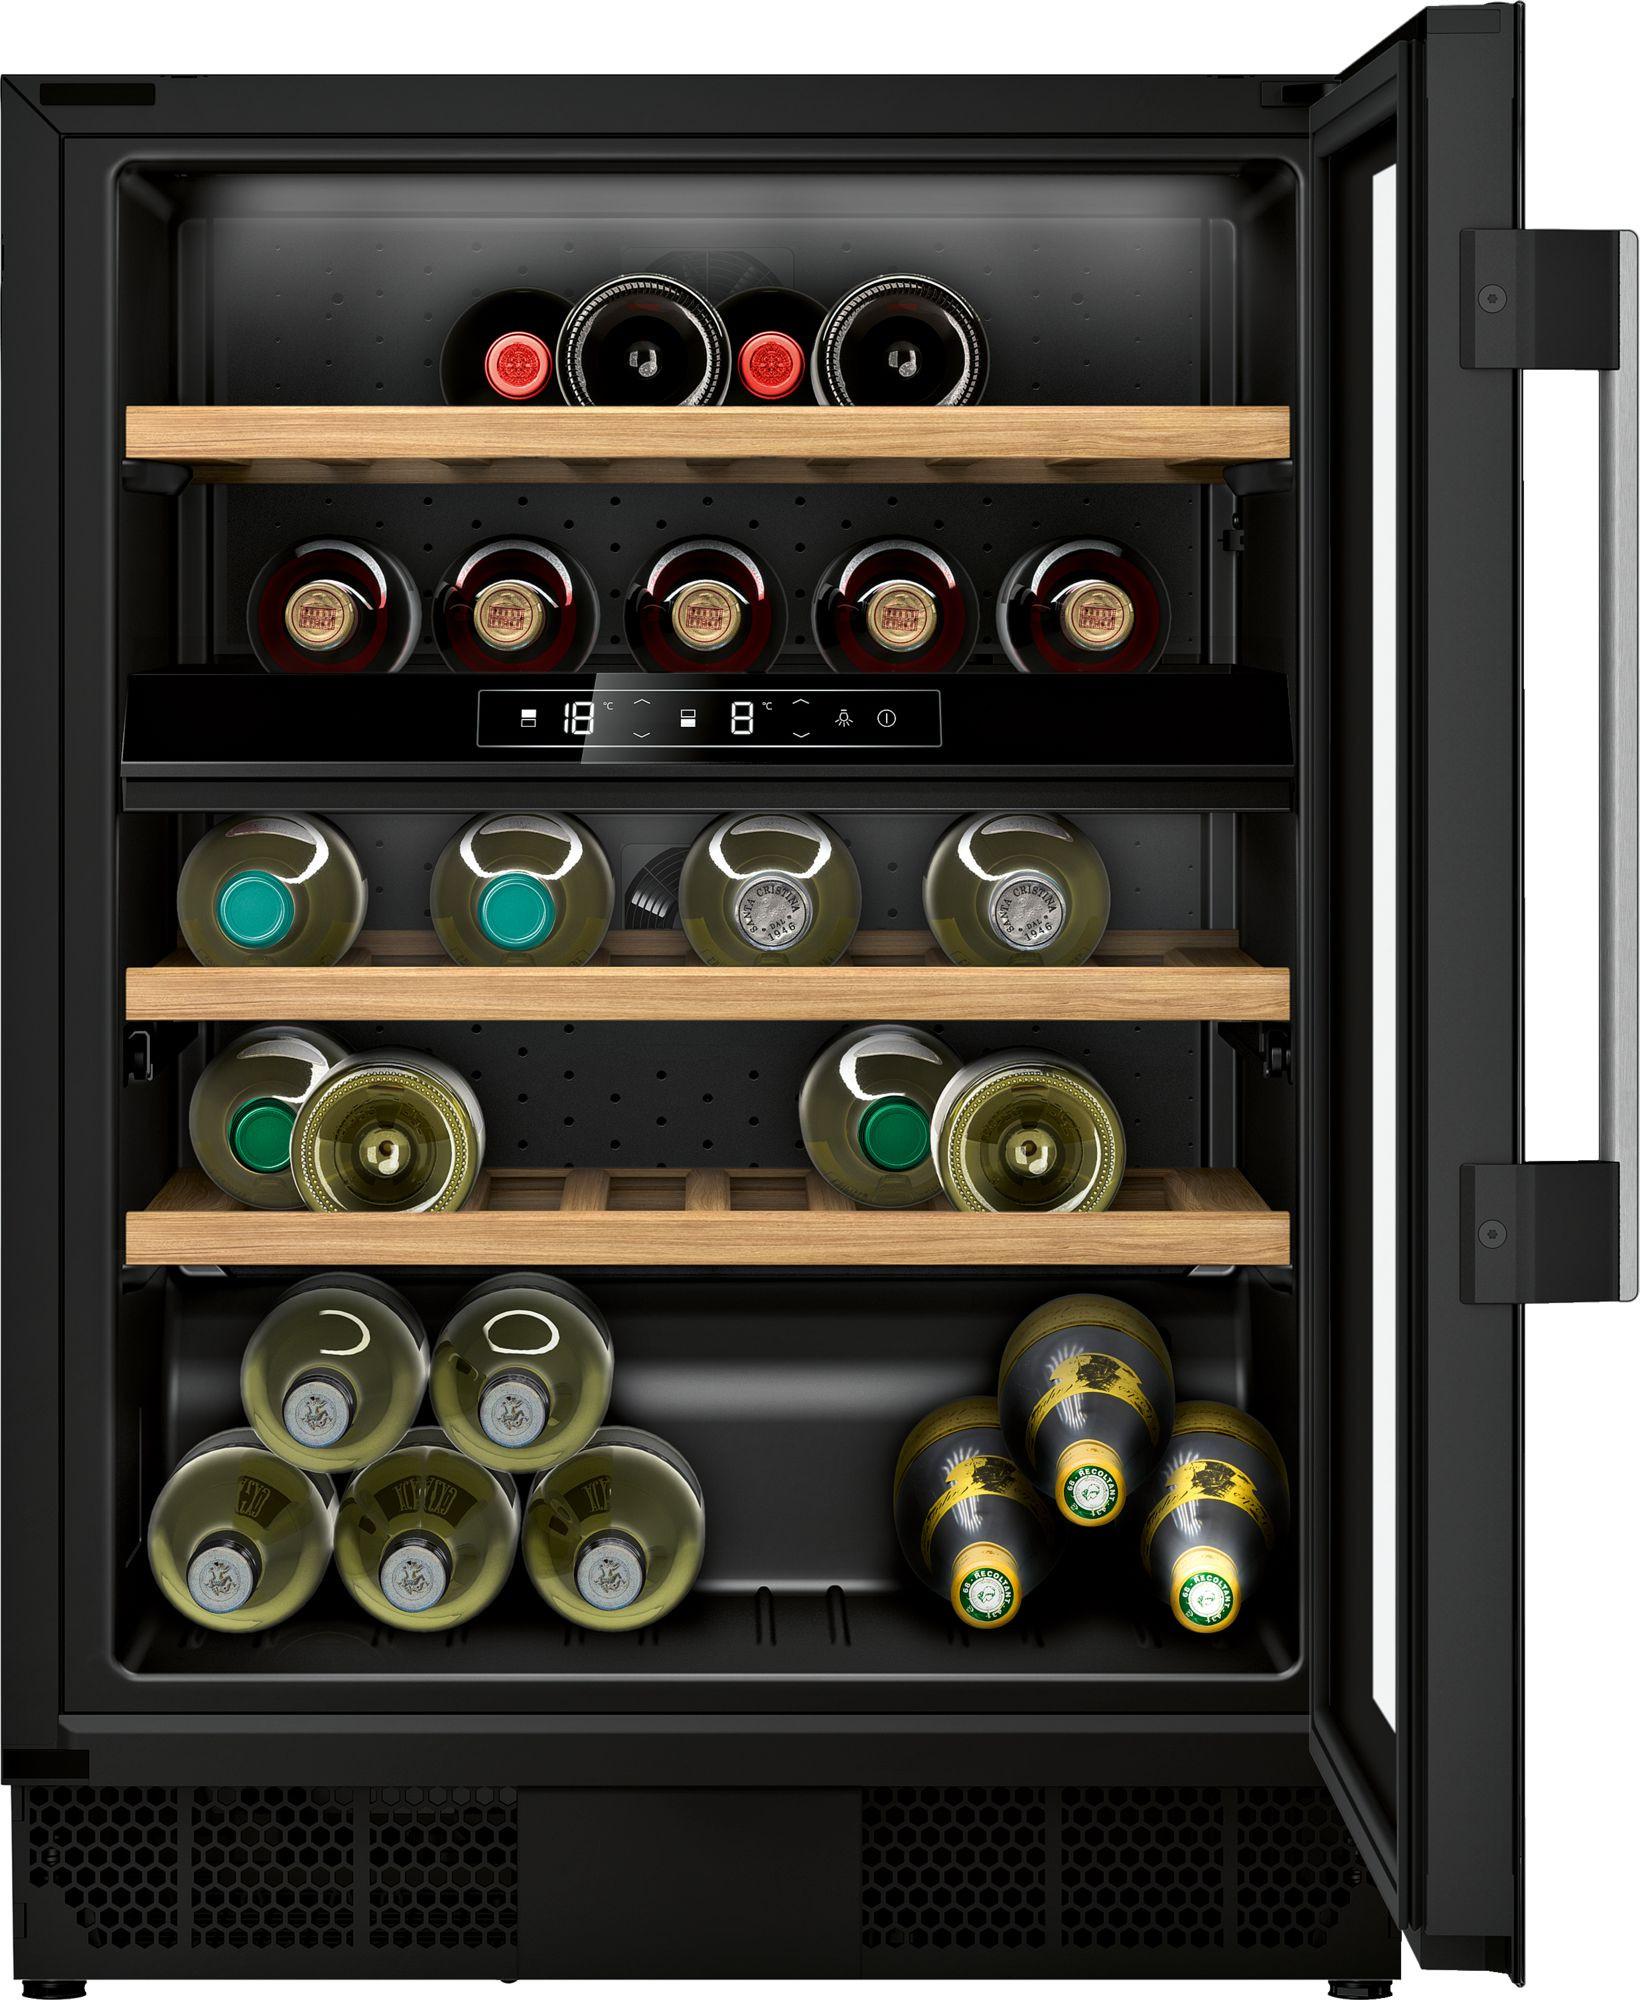 Neff N70 Wine Cooler With Glass Door 82x60cm KU9213HG0G